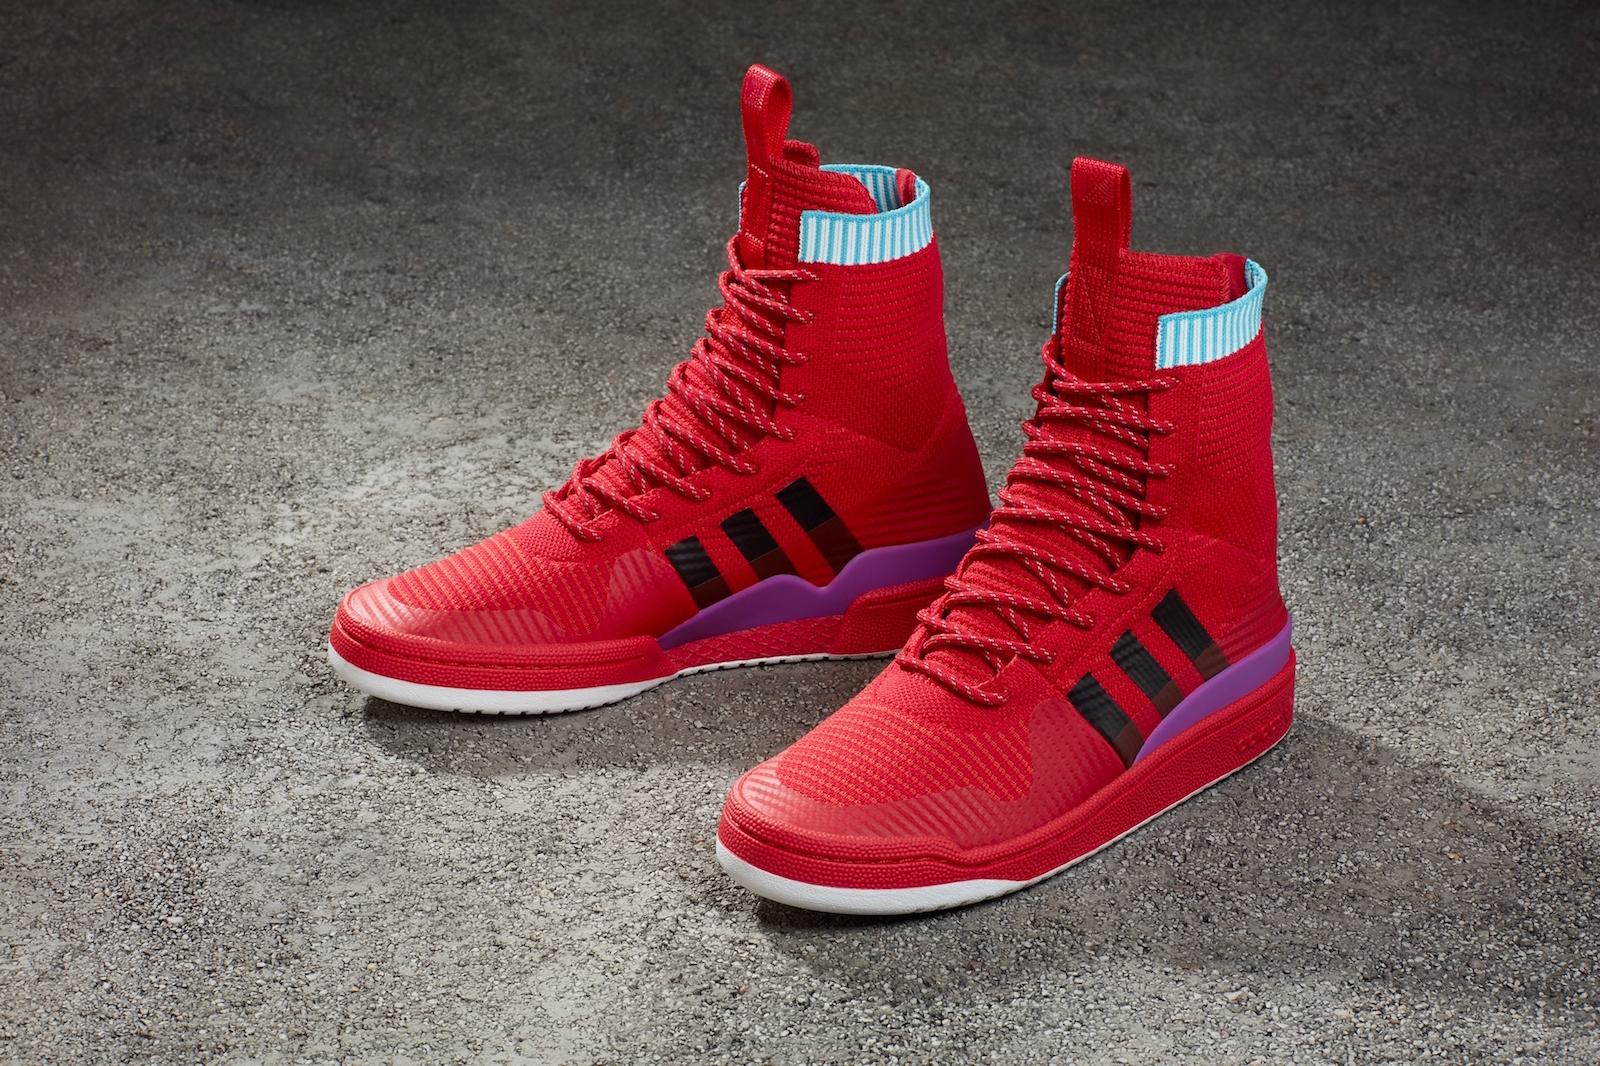 quality design 9d72a 35f6e adidas winter a.f. 1.4 primeknit quotcore blackquot adidas originals forum  primeknit winter 2